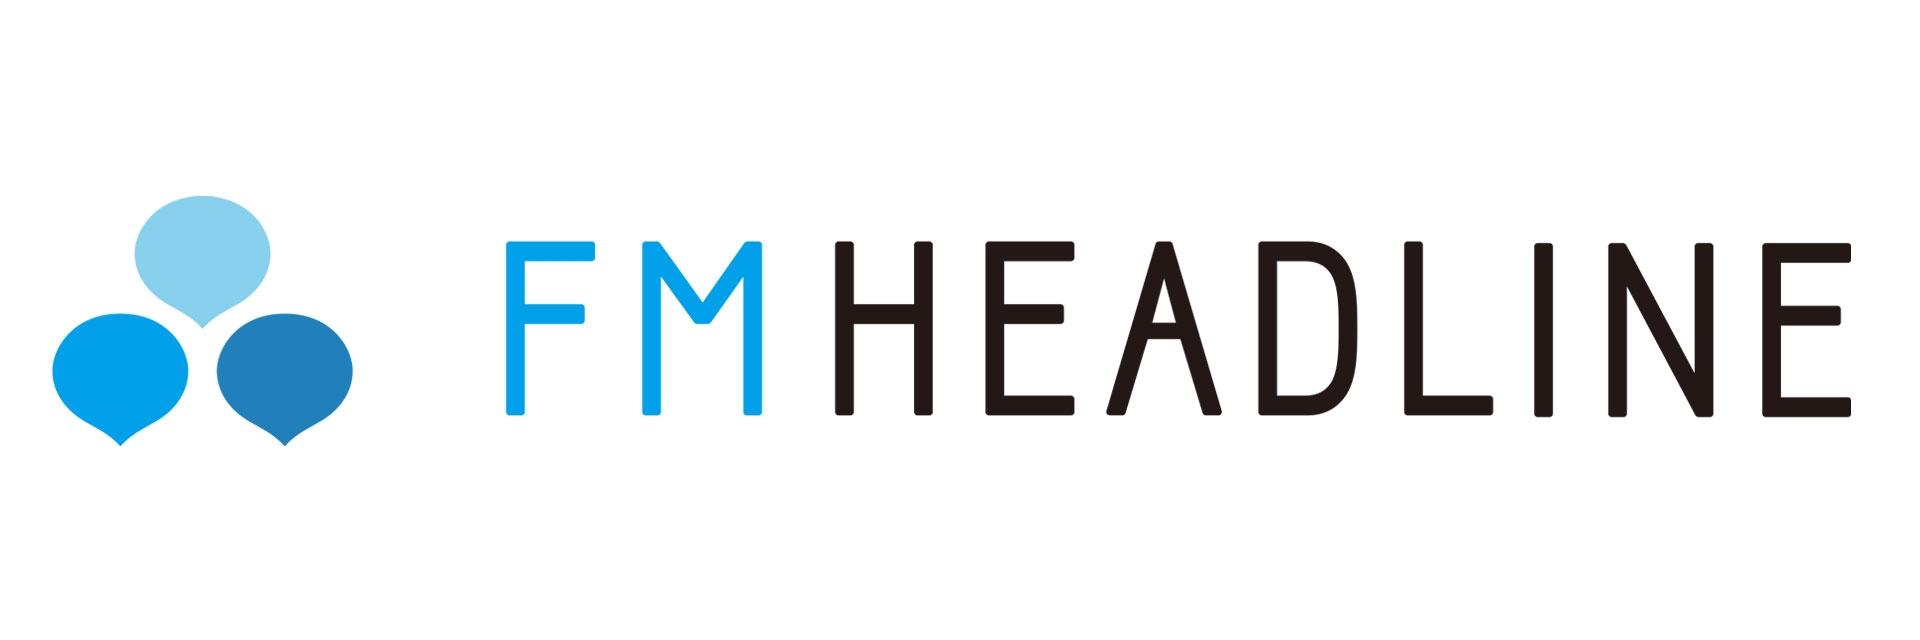 FM HEAD LINE